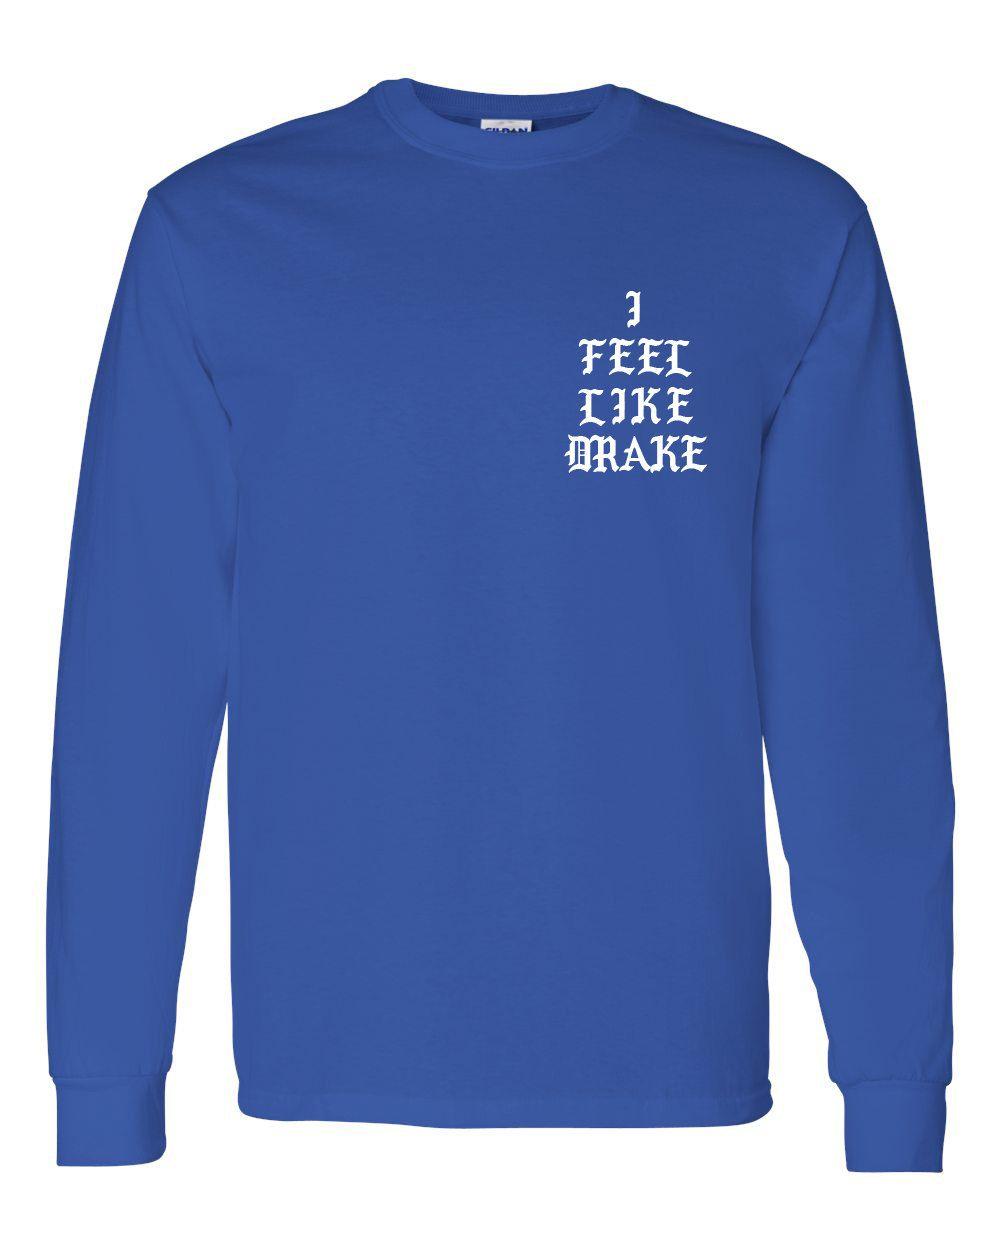 5171da80695 I Feel Like Drake Long Sleeve T-Shirt by ArtsByBlanco on Etsy ...